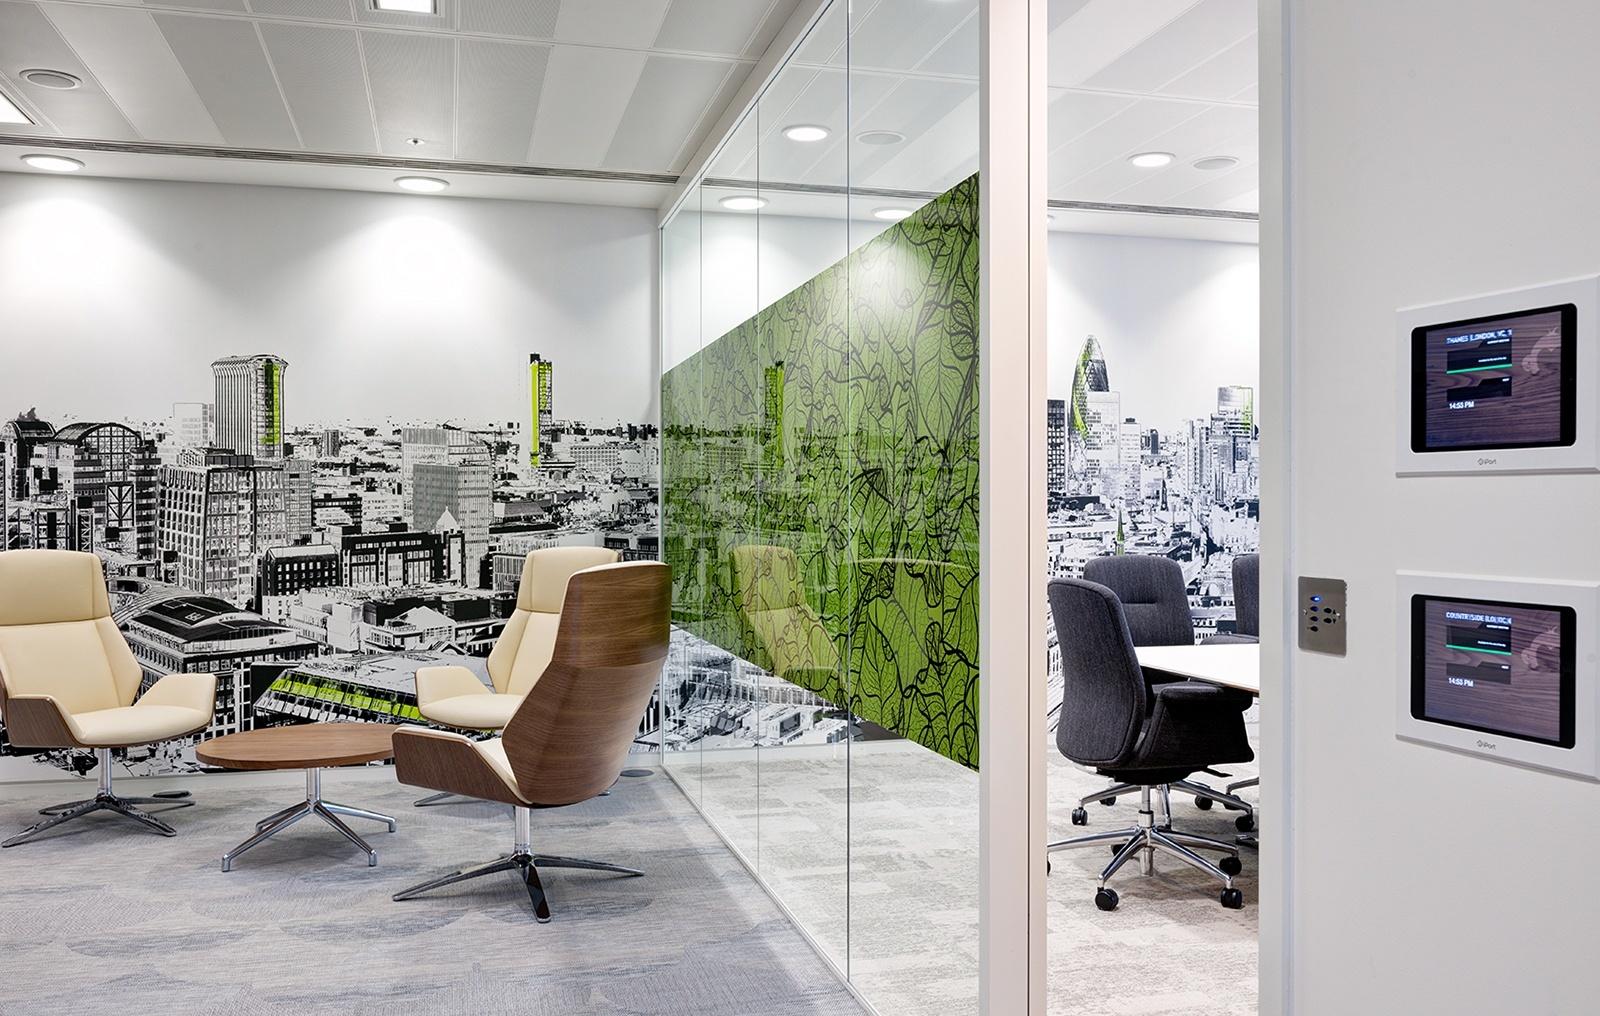 survey-monkey-london-office-1